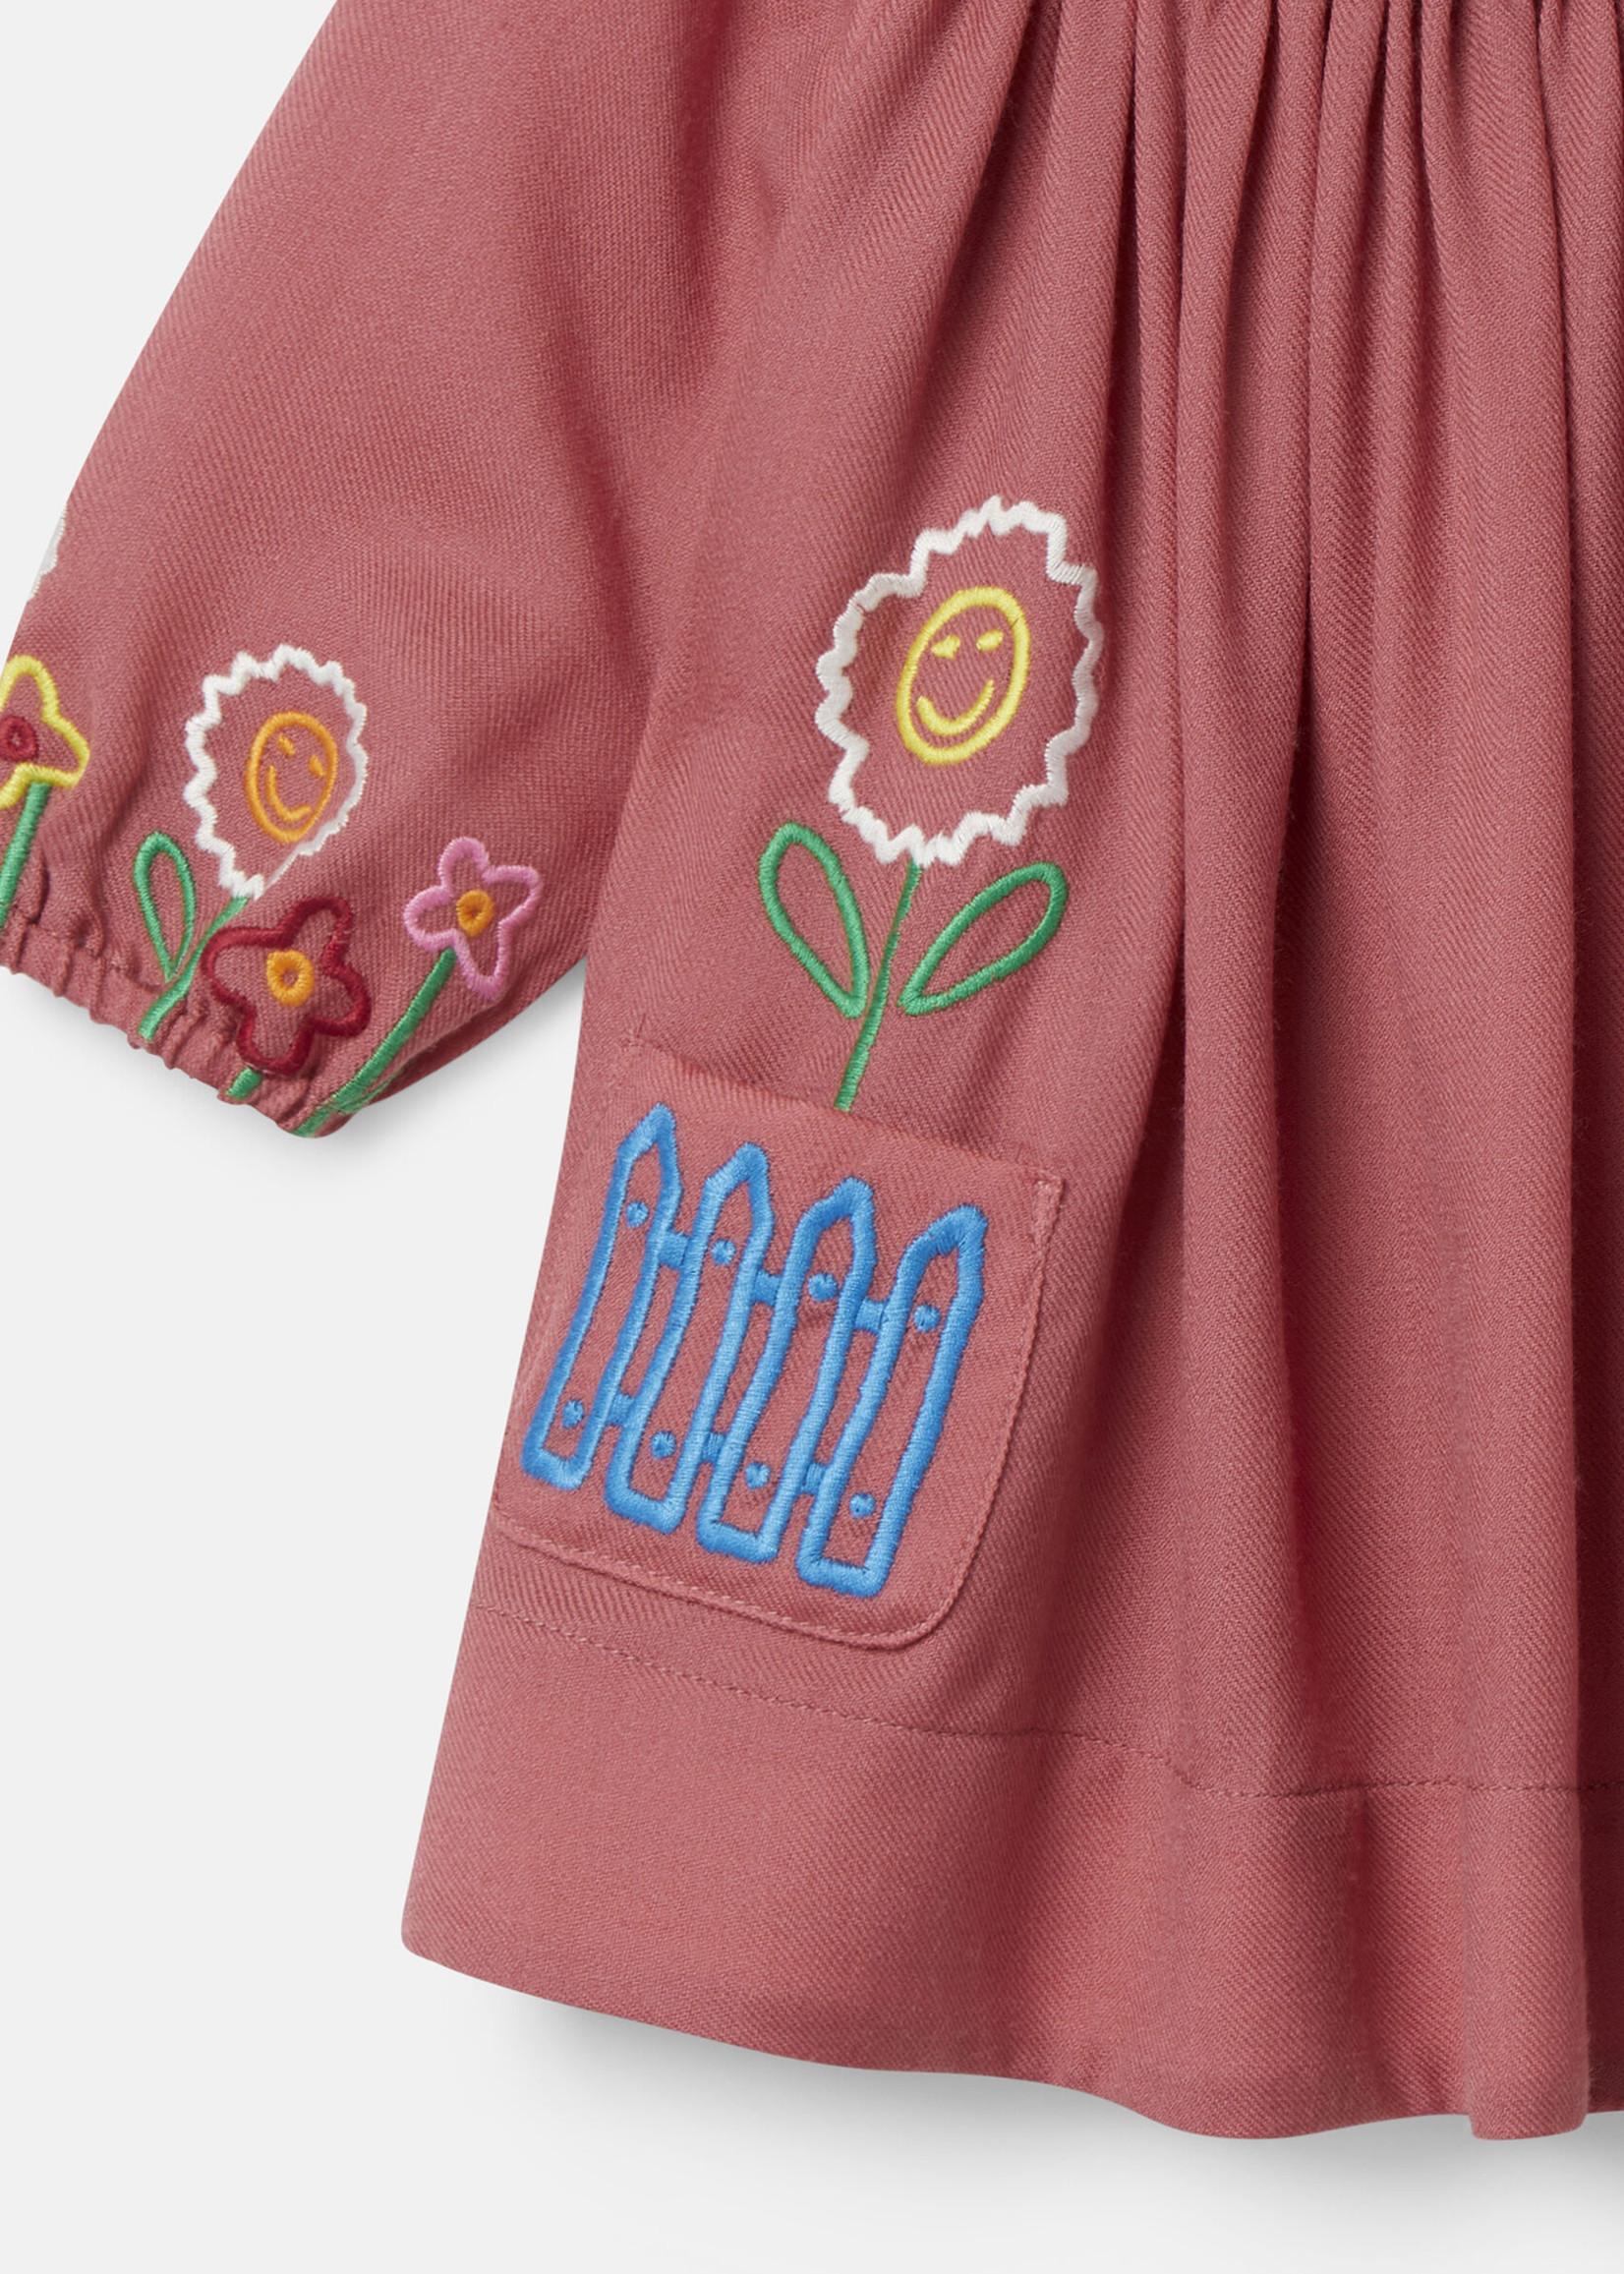 Stella McCartney Stella McCartney-AW21 603367 DRESS